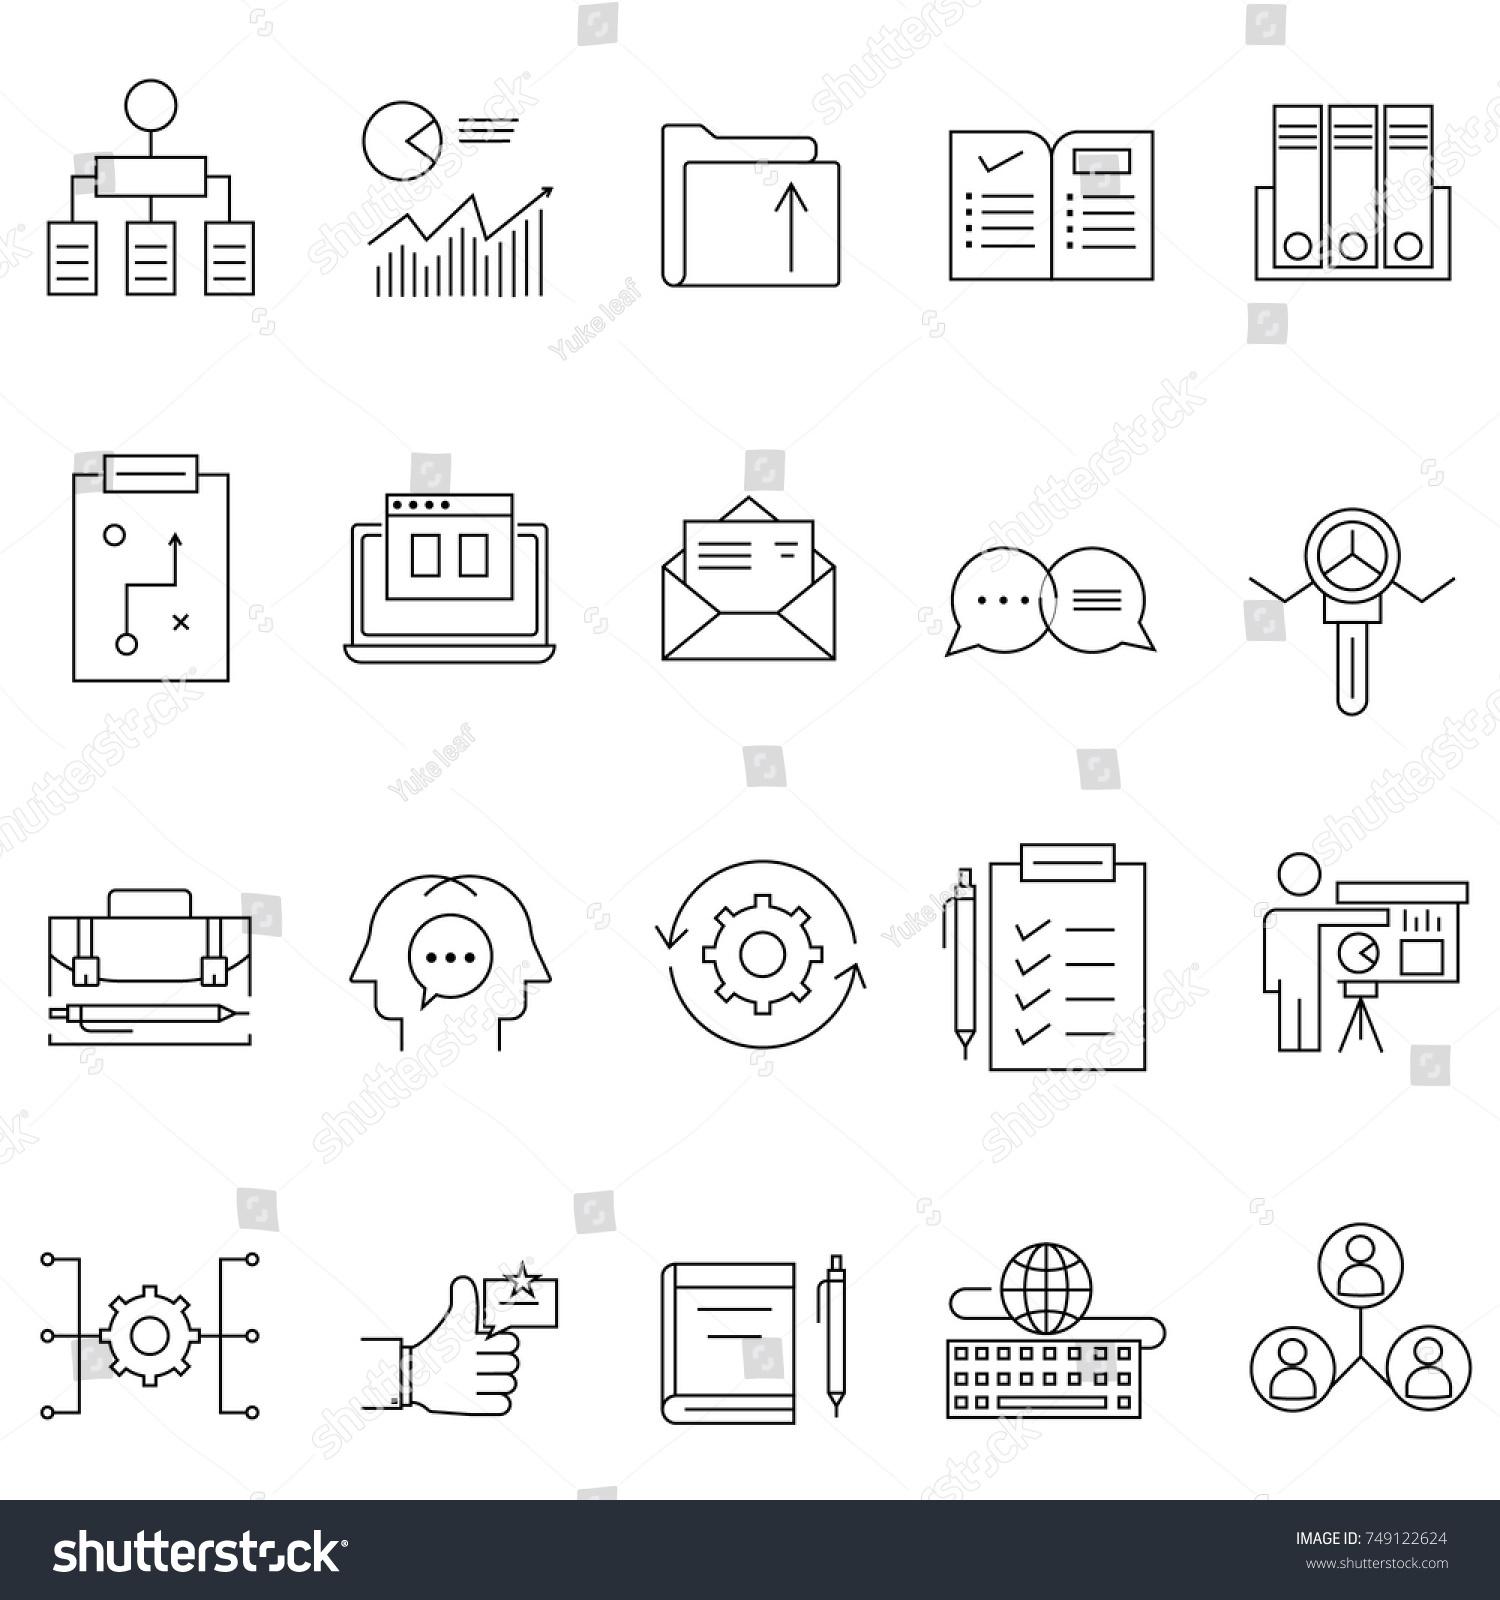 Work flow business line icon illustration chart stock vector work flow and business line icon illustration chart flow chart internet technology nvjuhfo Choice Image